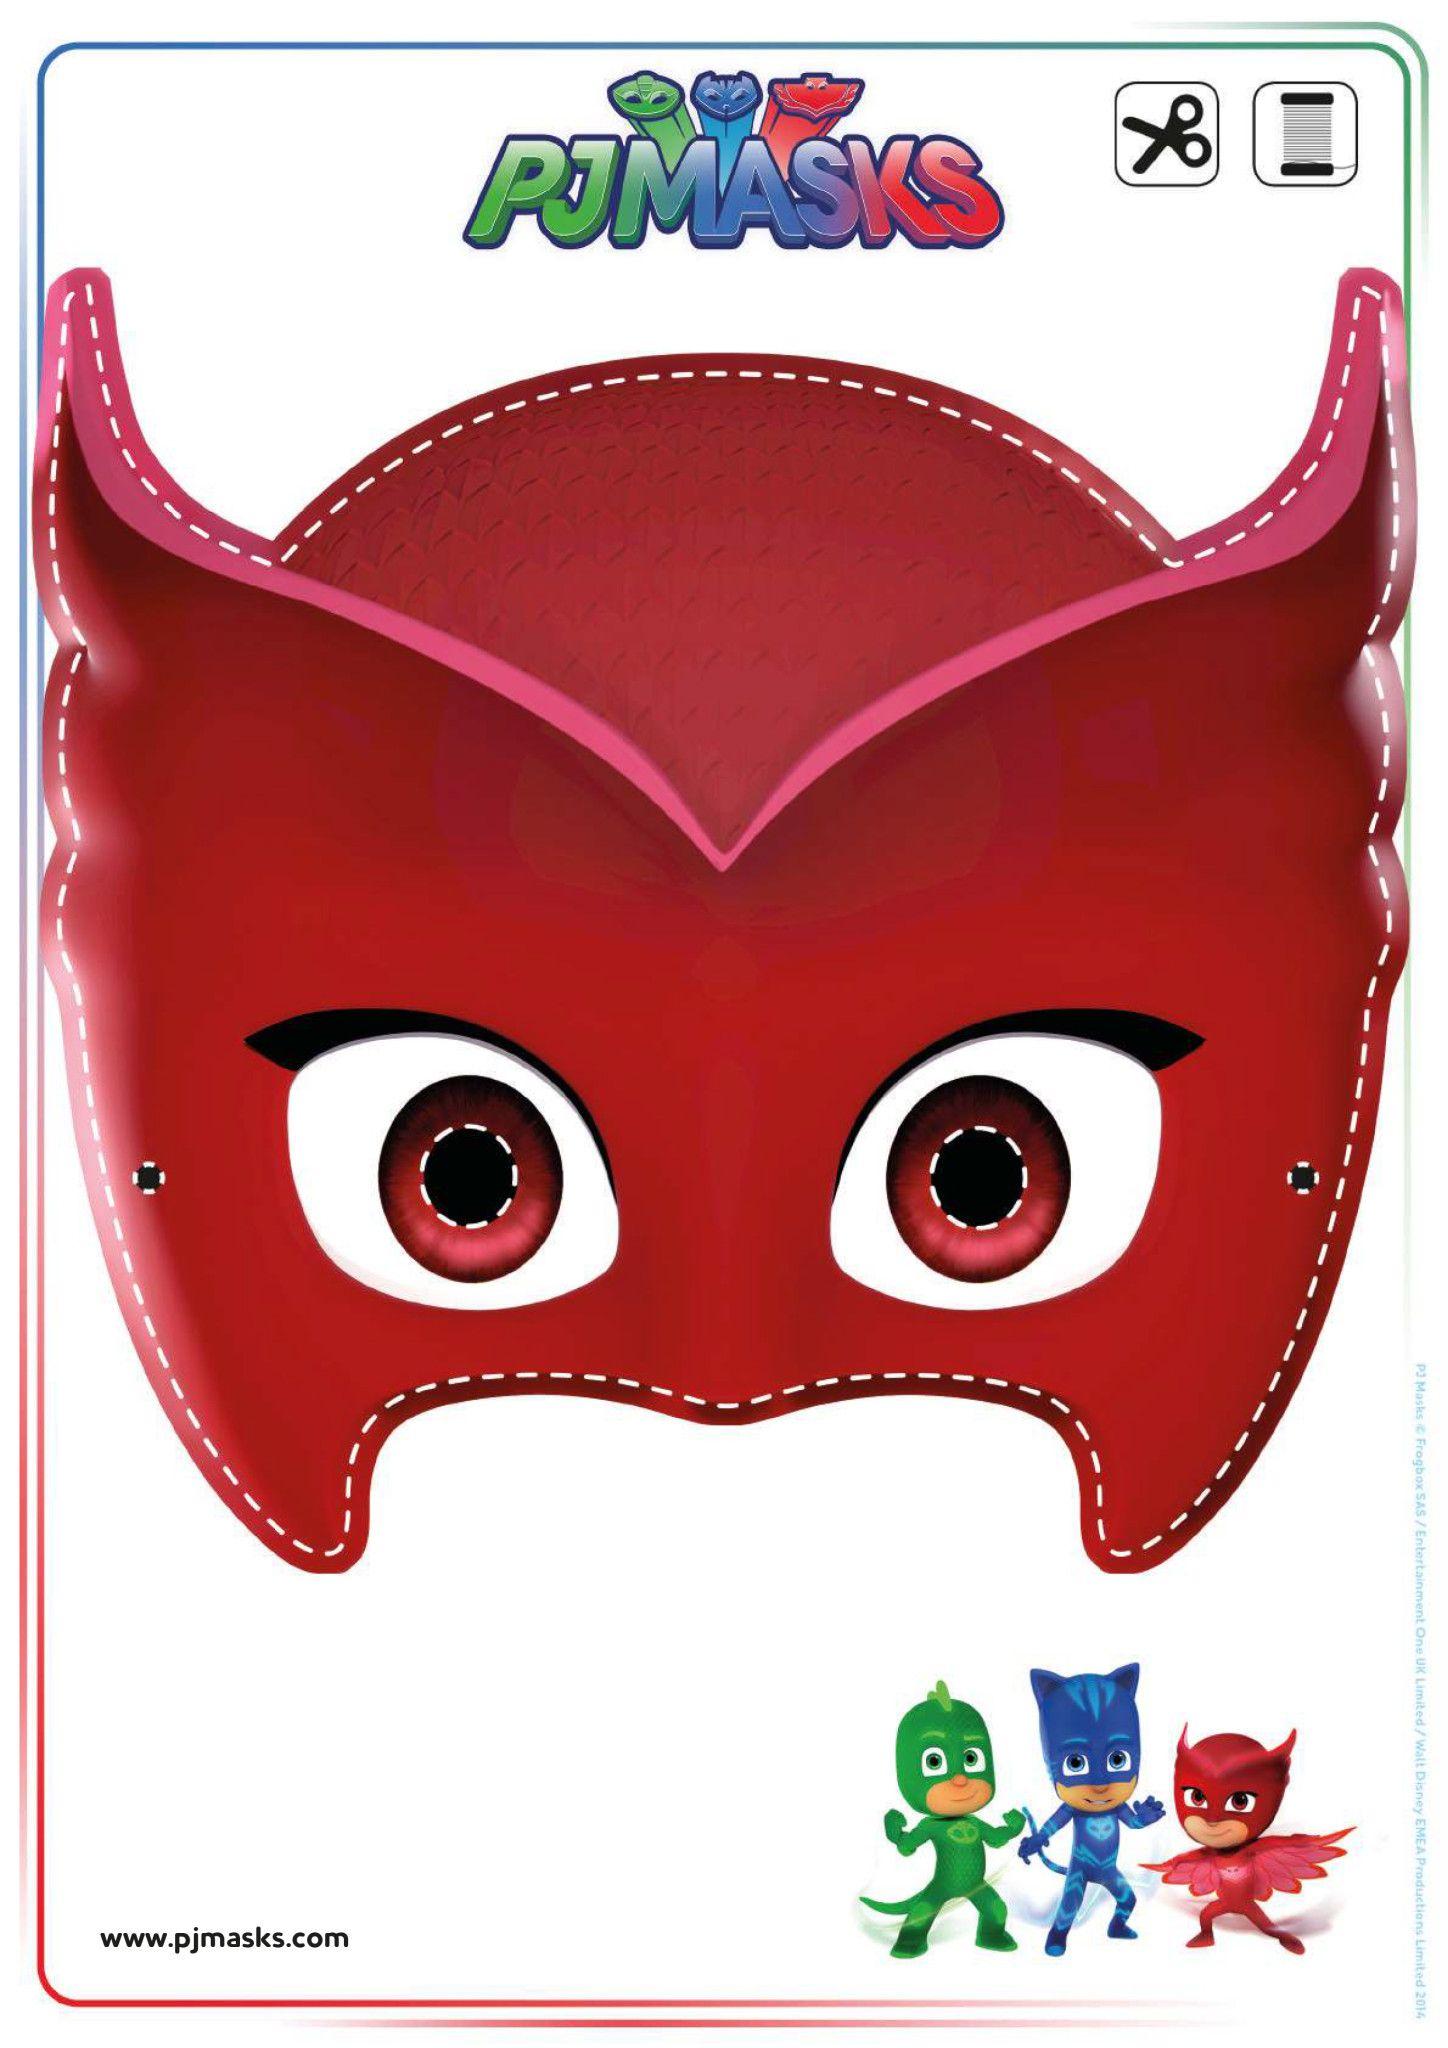 Printables – Pj Masks Owlette, Gekko, & Catboy Masks | Joey's 3Rd - Free Printable Halloween Iron Ons